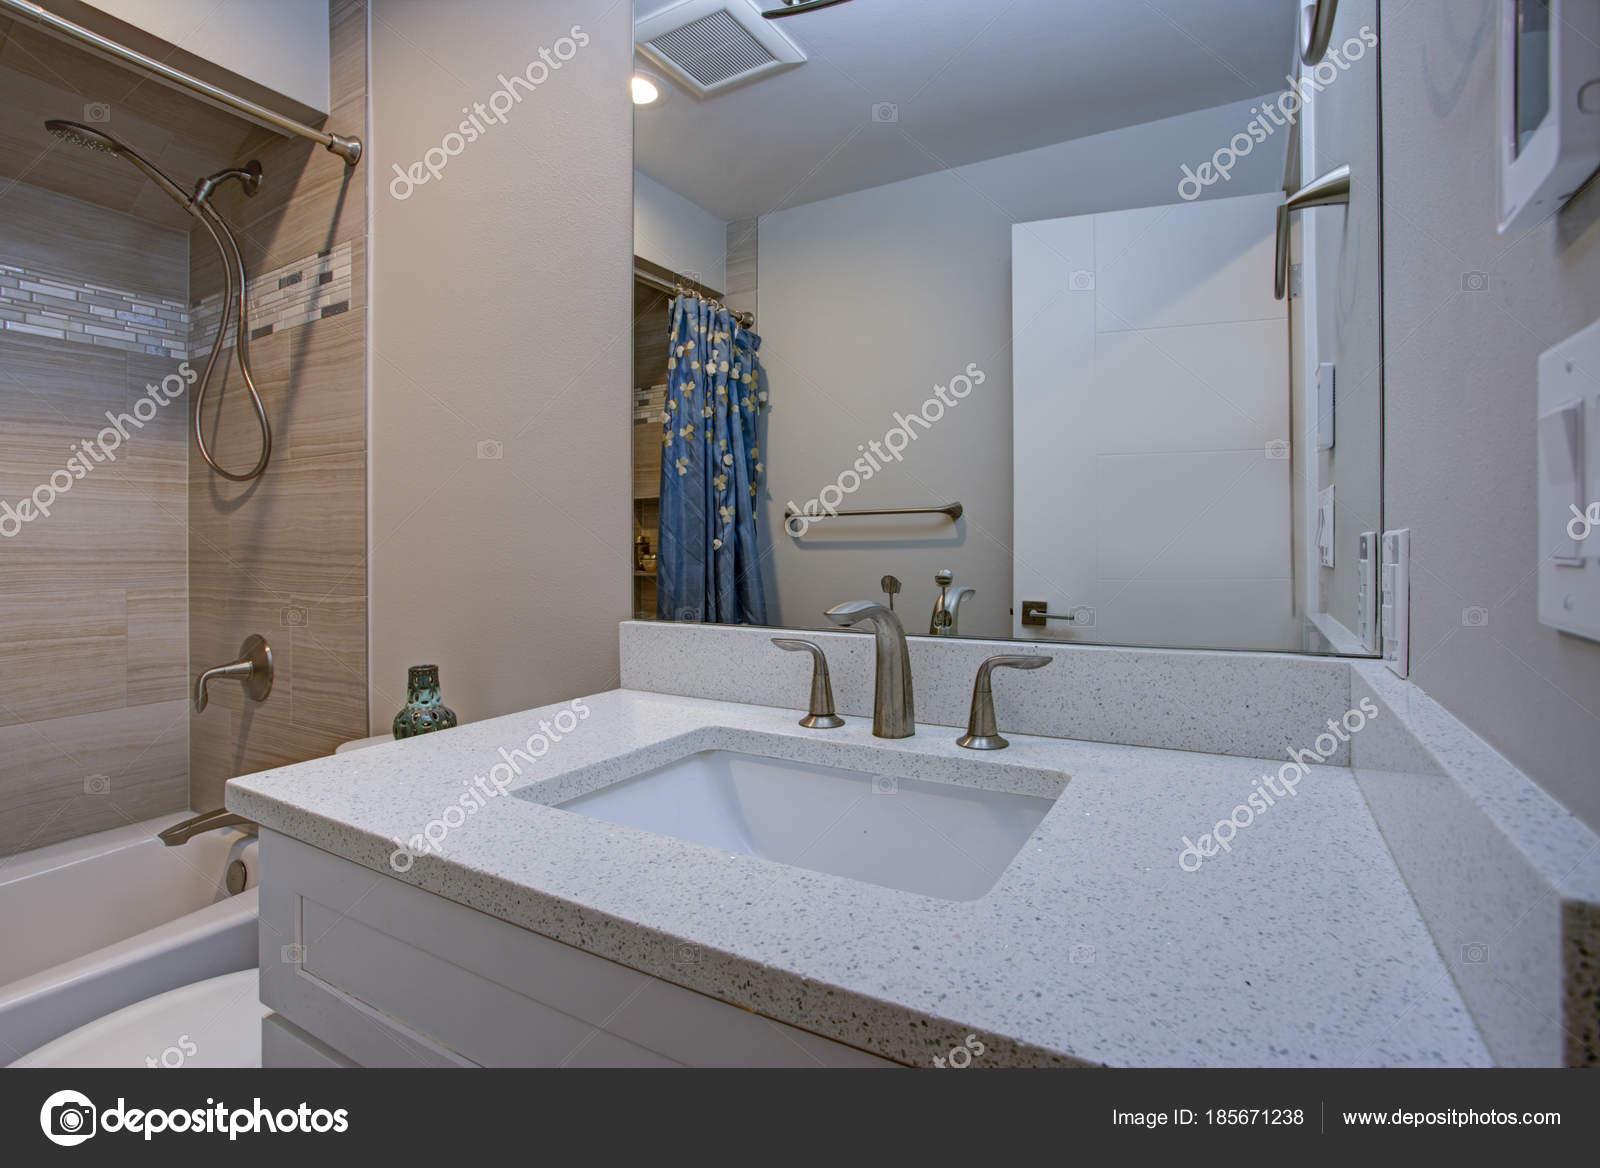 Marmeren Badkamer Vloer : Elegante badkamer met marmeren badkamervloer u2014 stockfoto © alabn